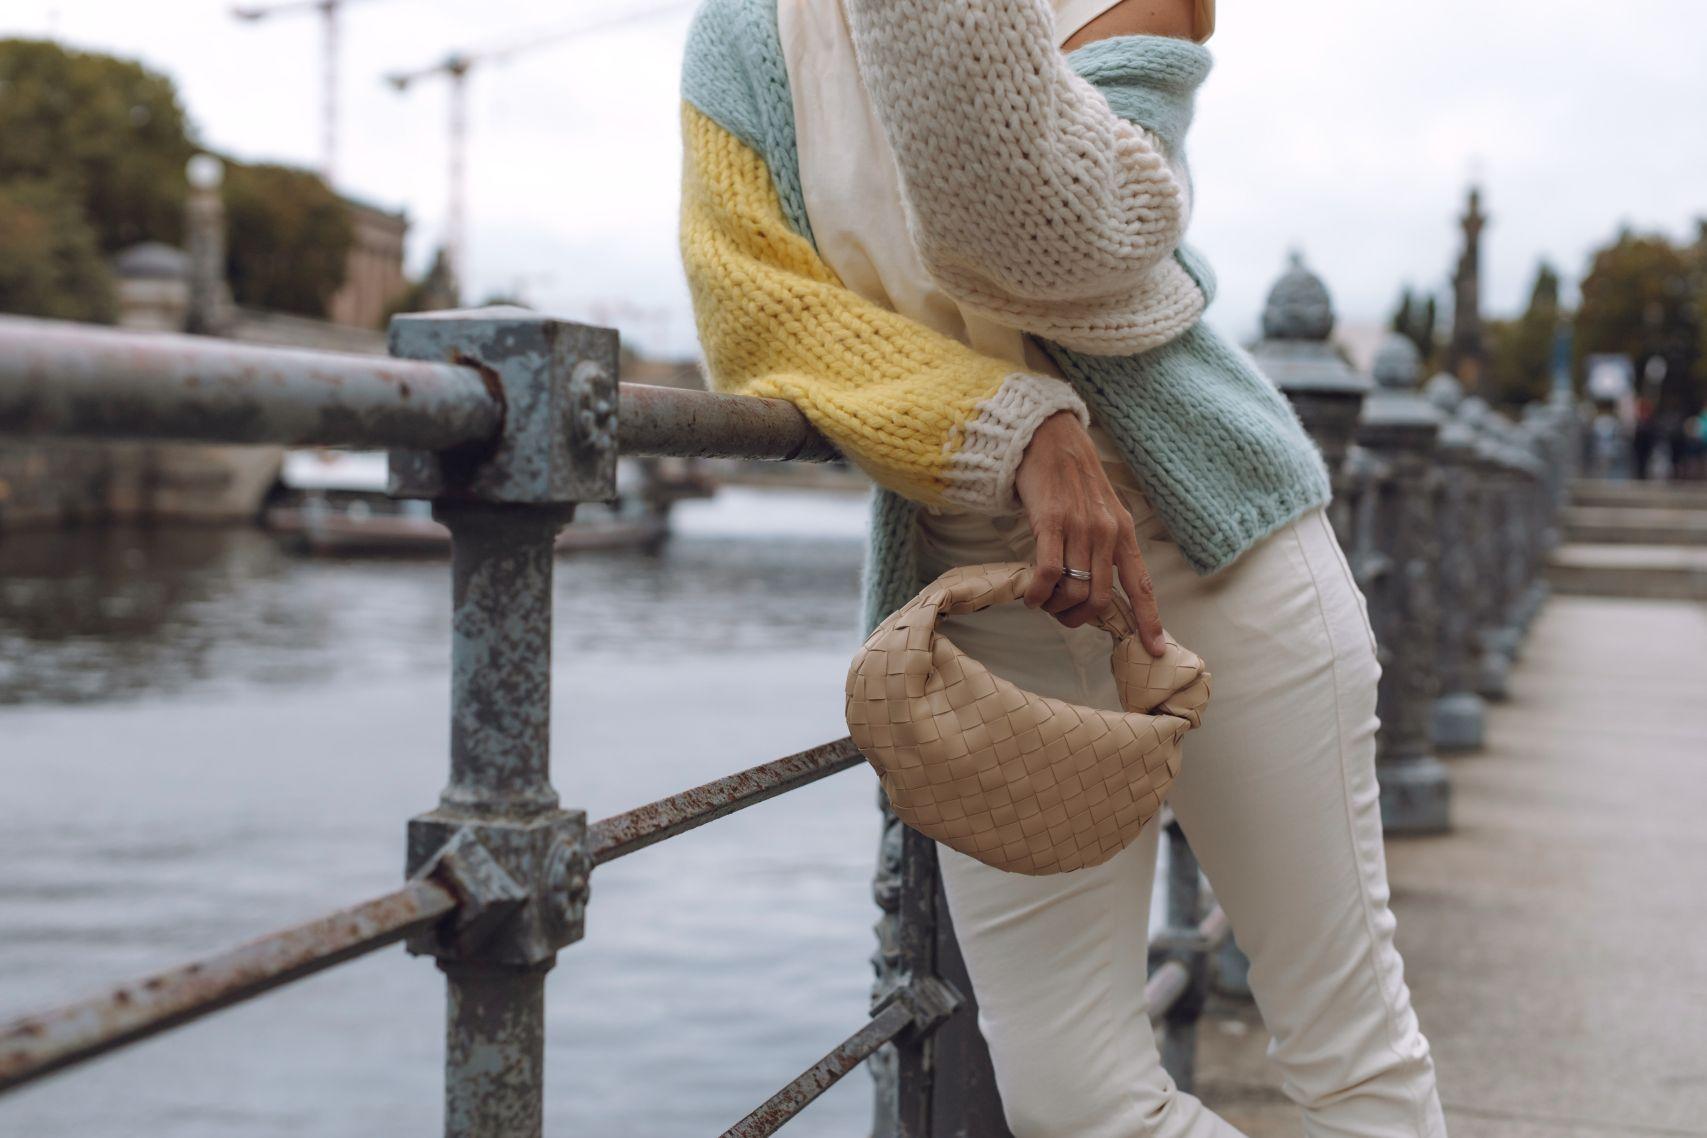 Bottega Veneta Jodie Bag Mini zum Evyinit Cardigan